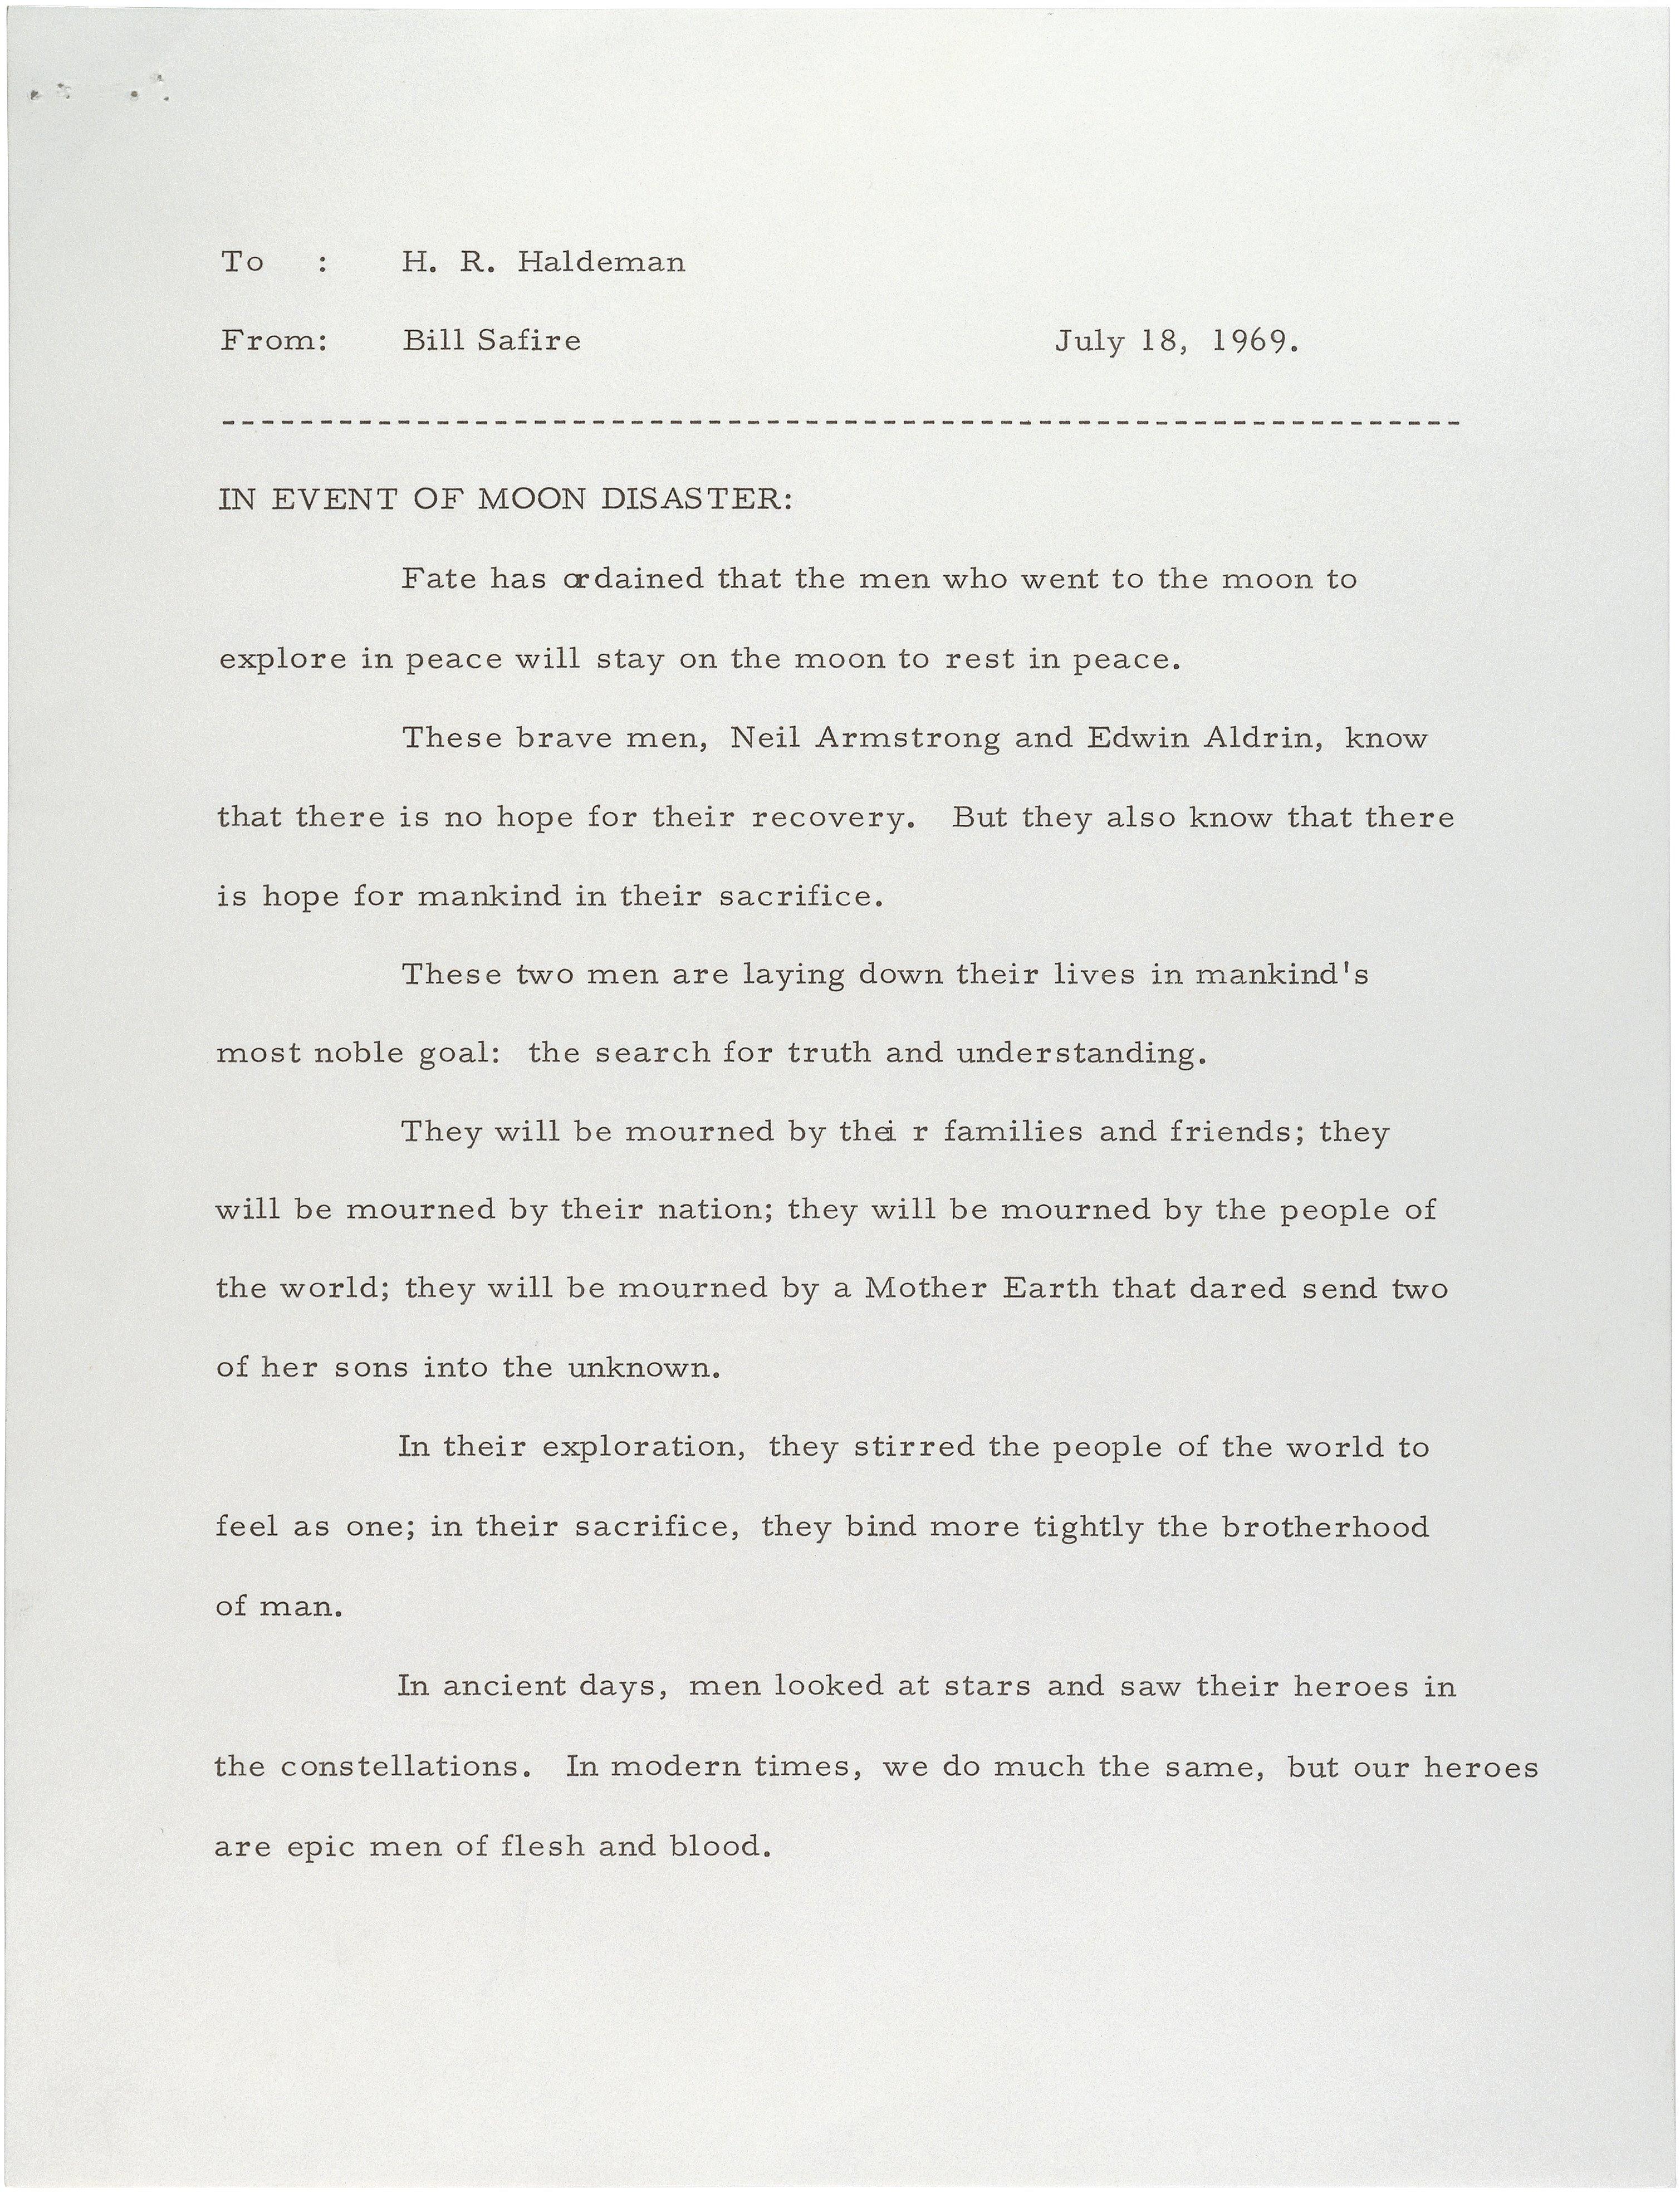 http://www.archives.gov/press/press-kits/american-originals-photos/moon-disaster-1.jpg